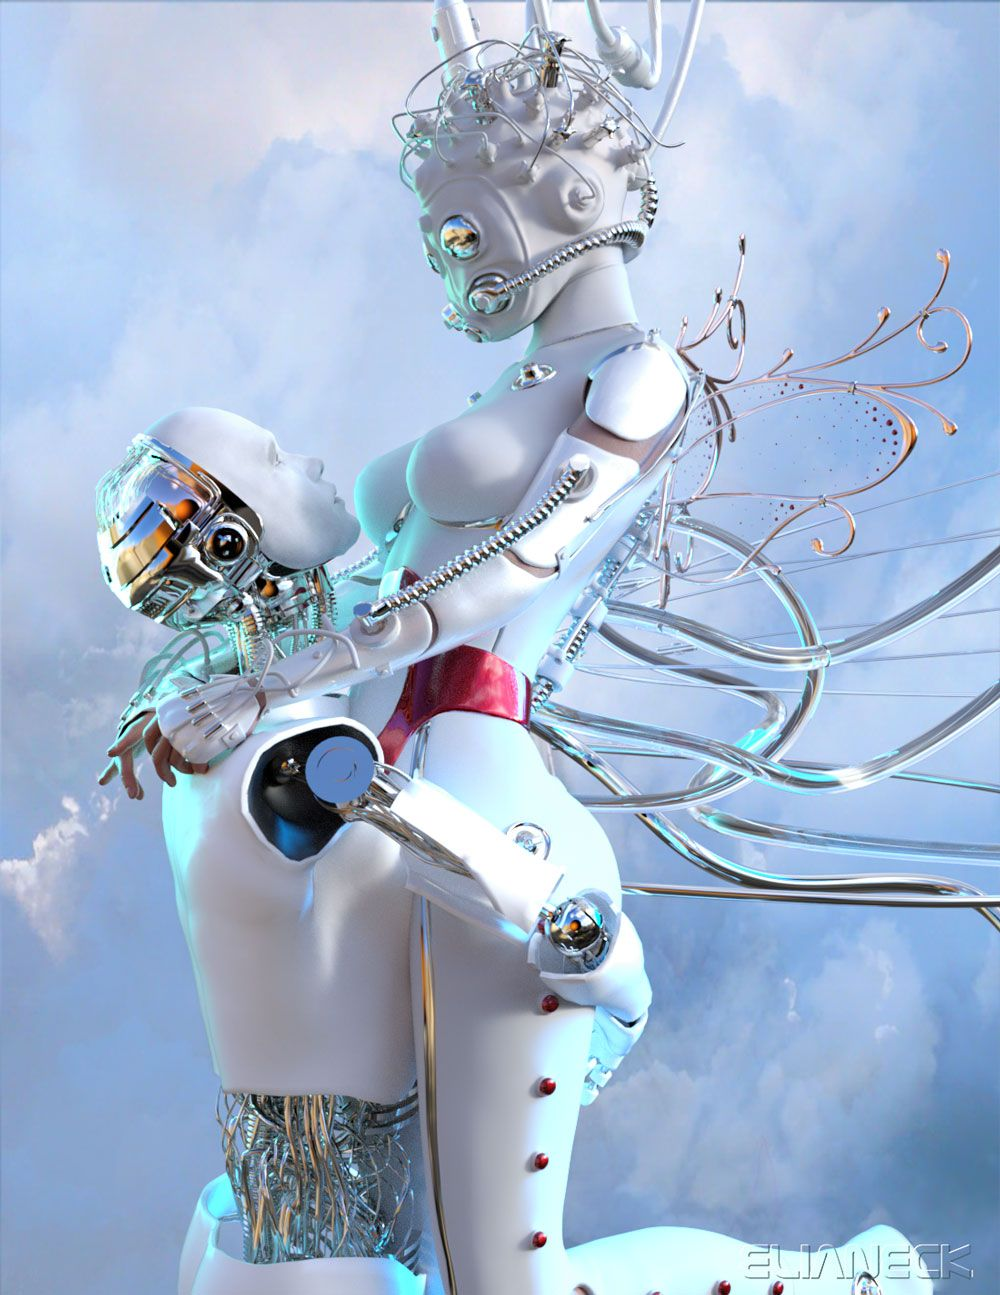 Cyber Cinderella By Elianeck Art Cyber 3d Artwork